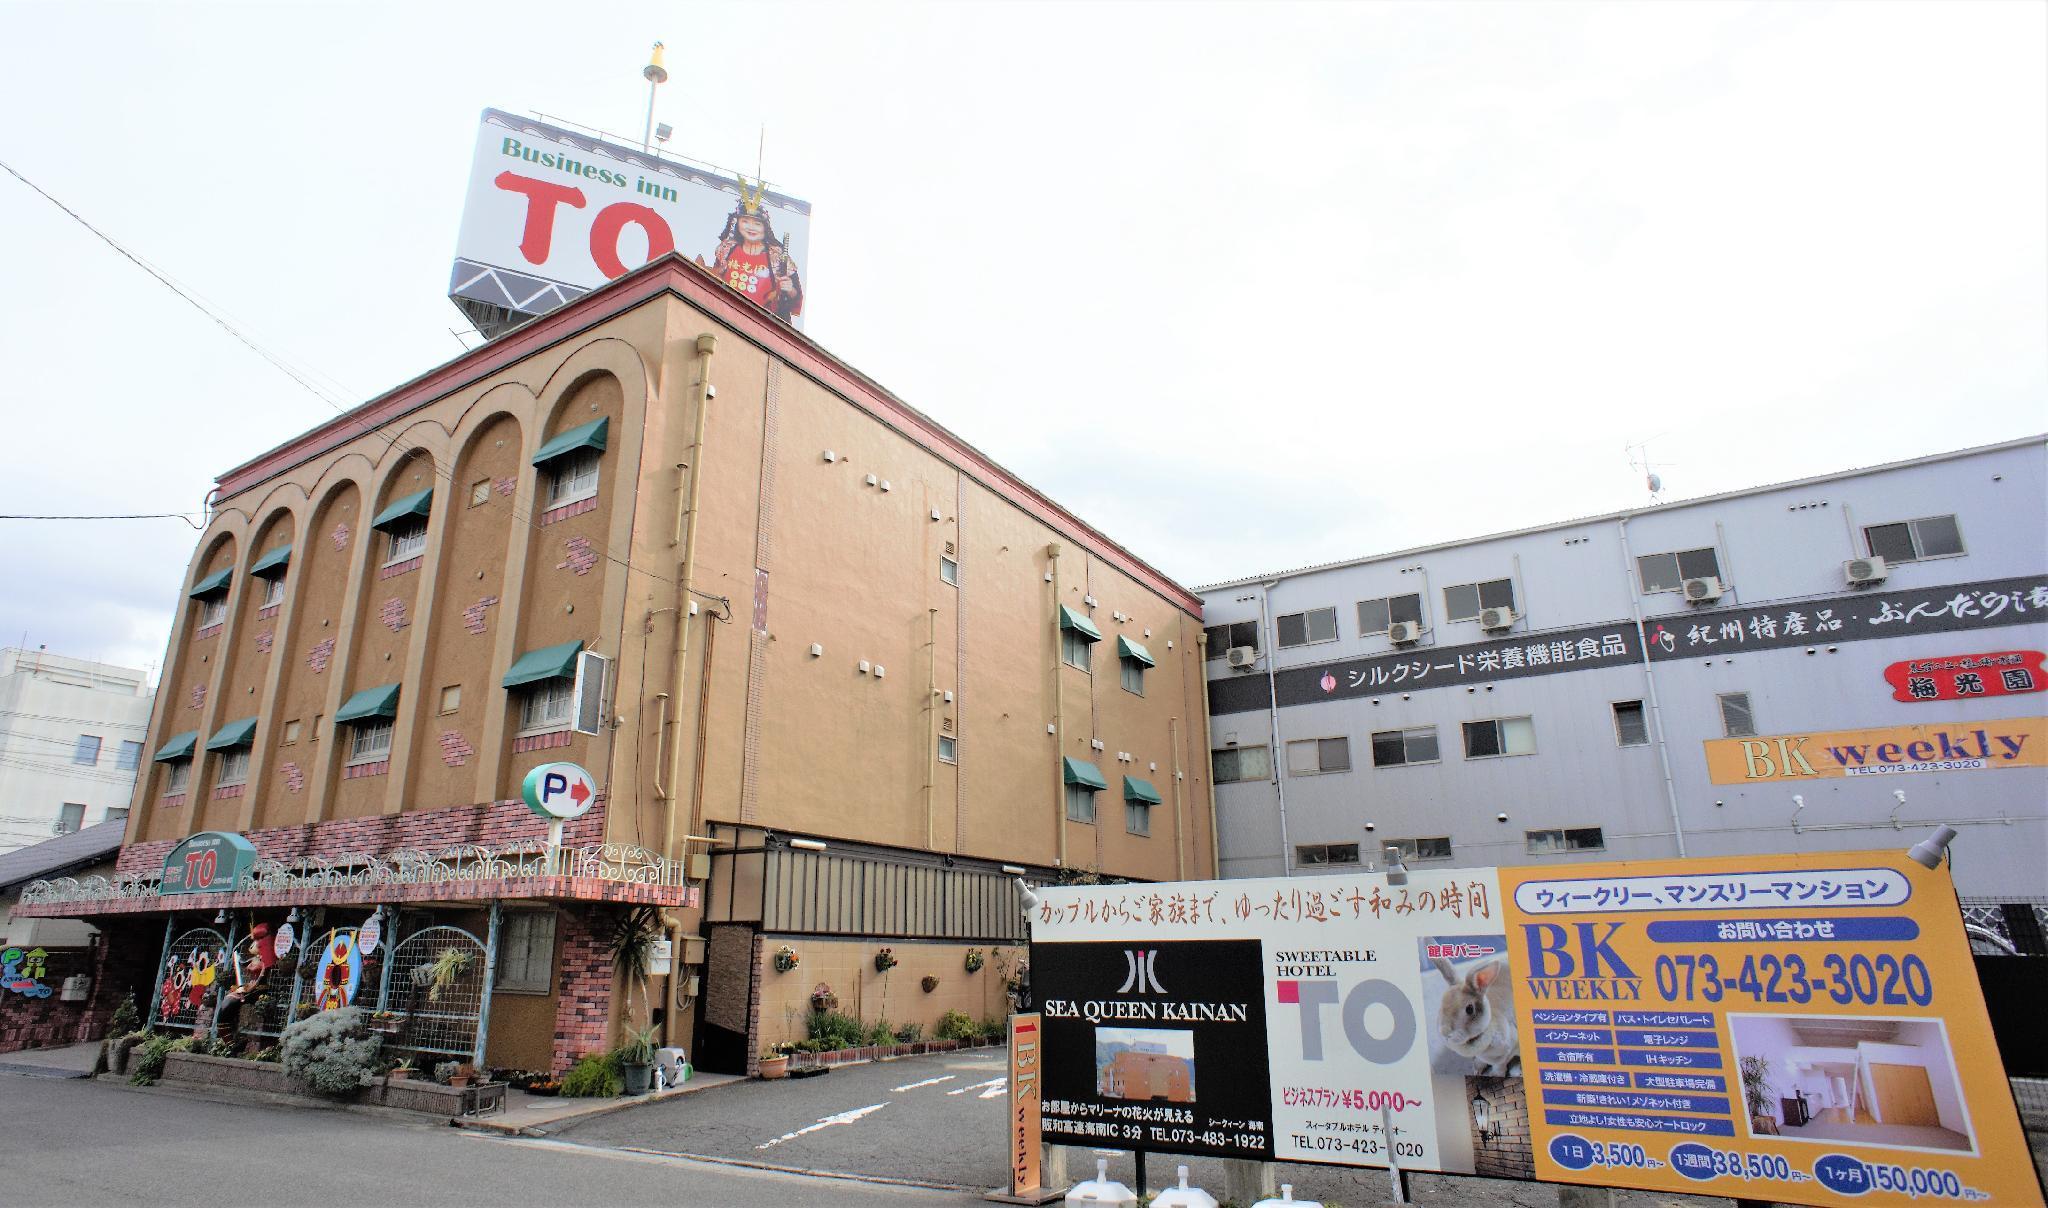 HOTEL TO, Wakayama